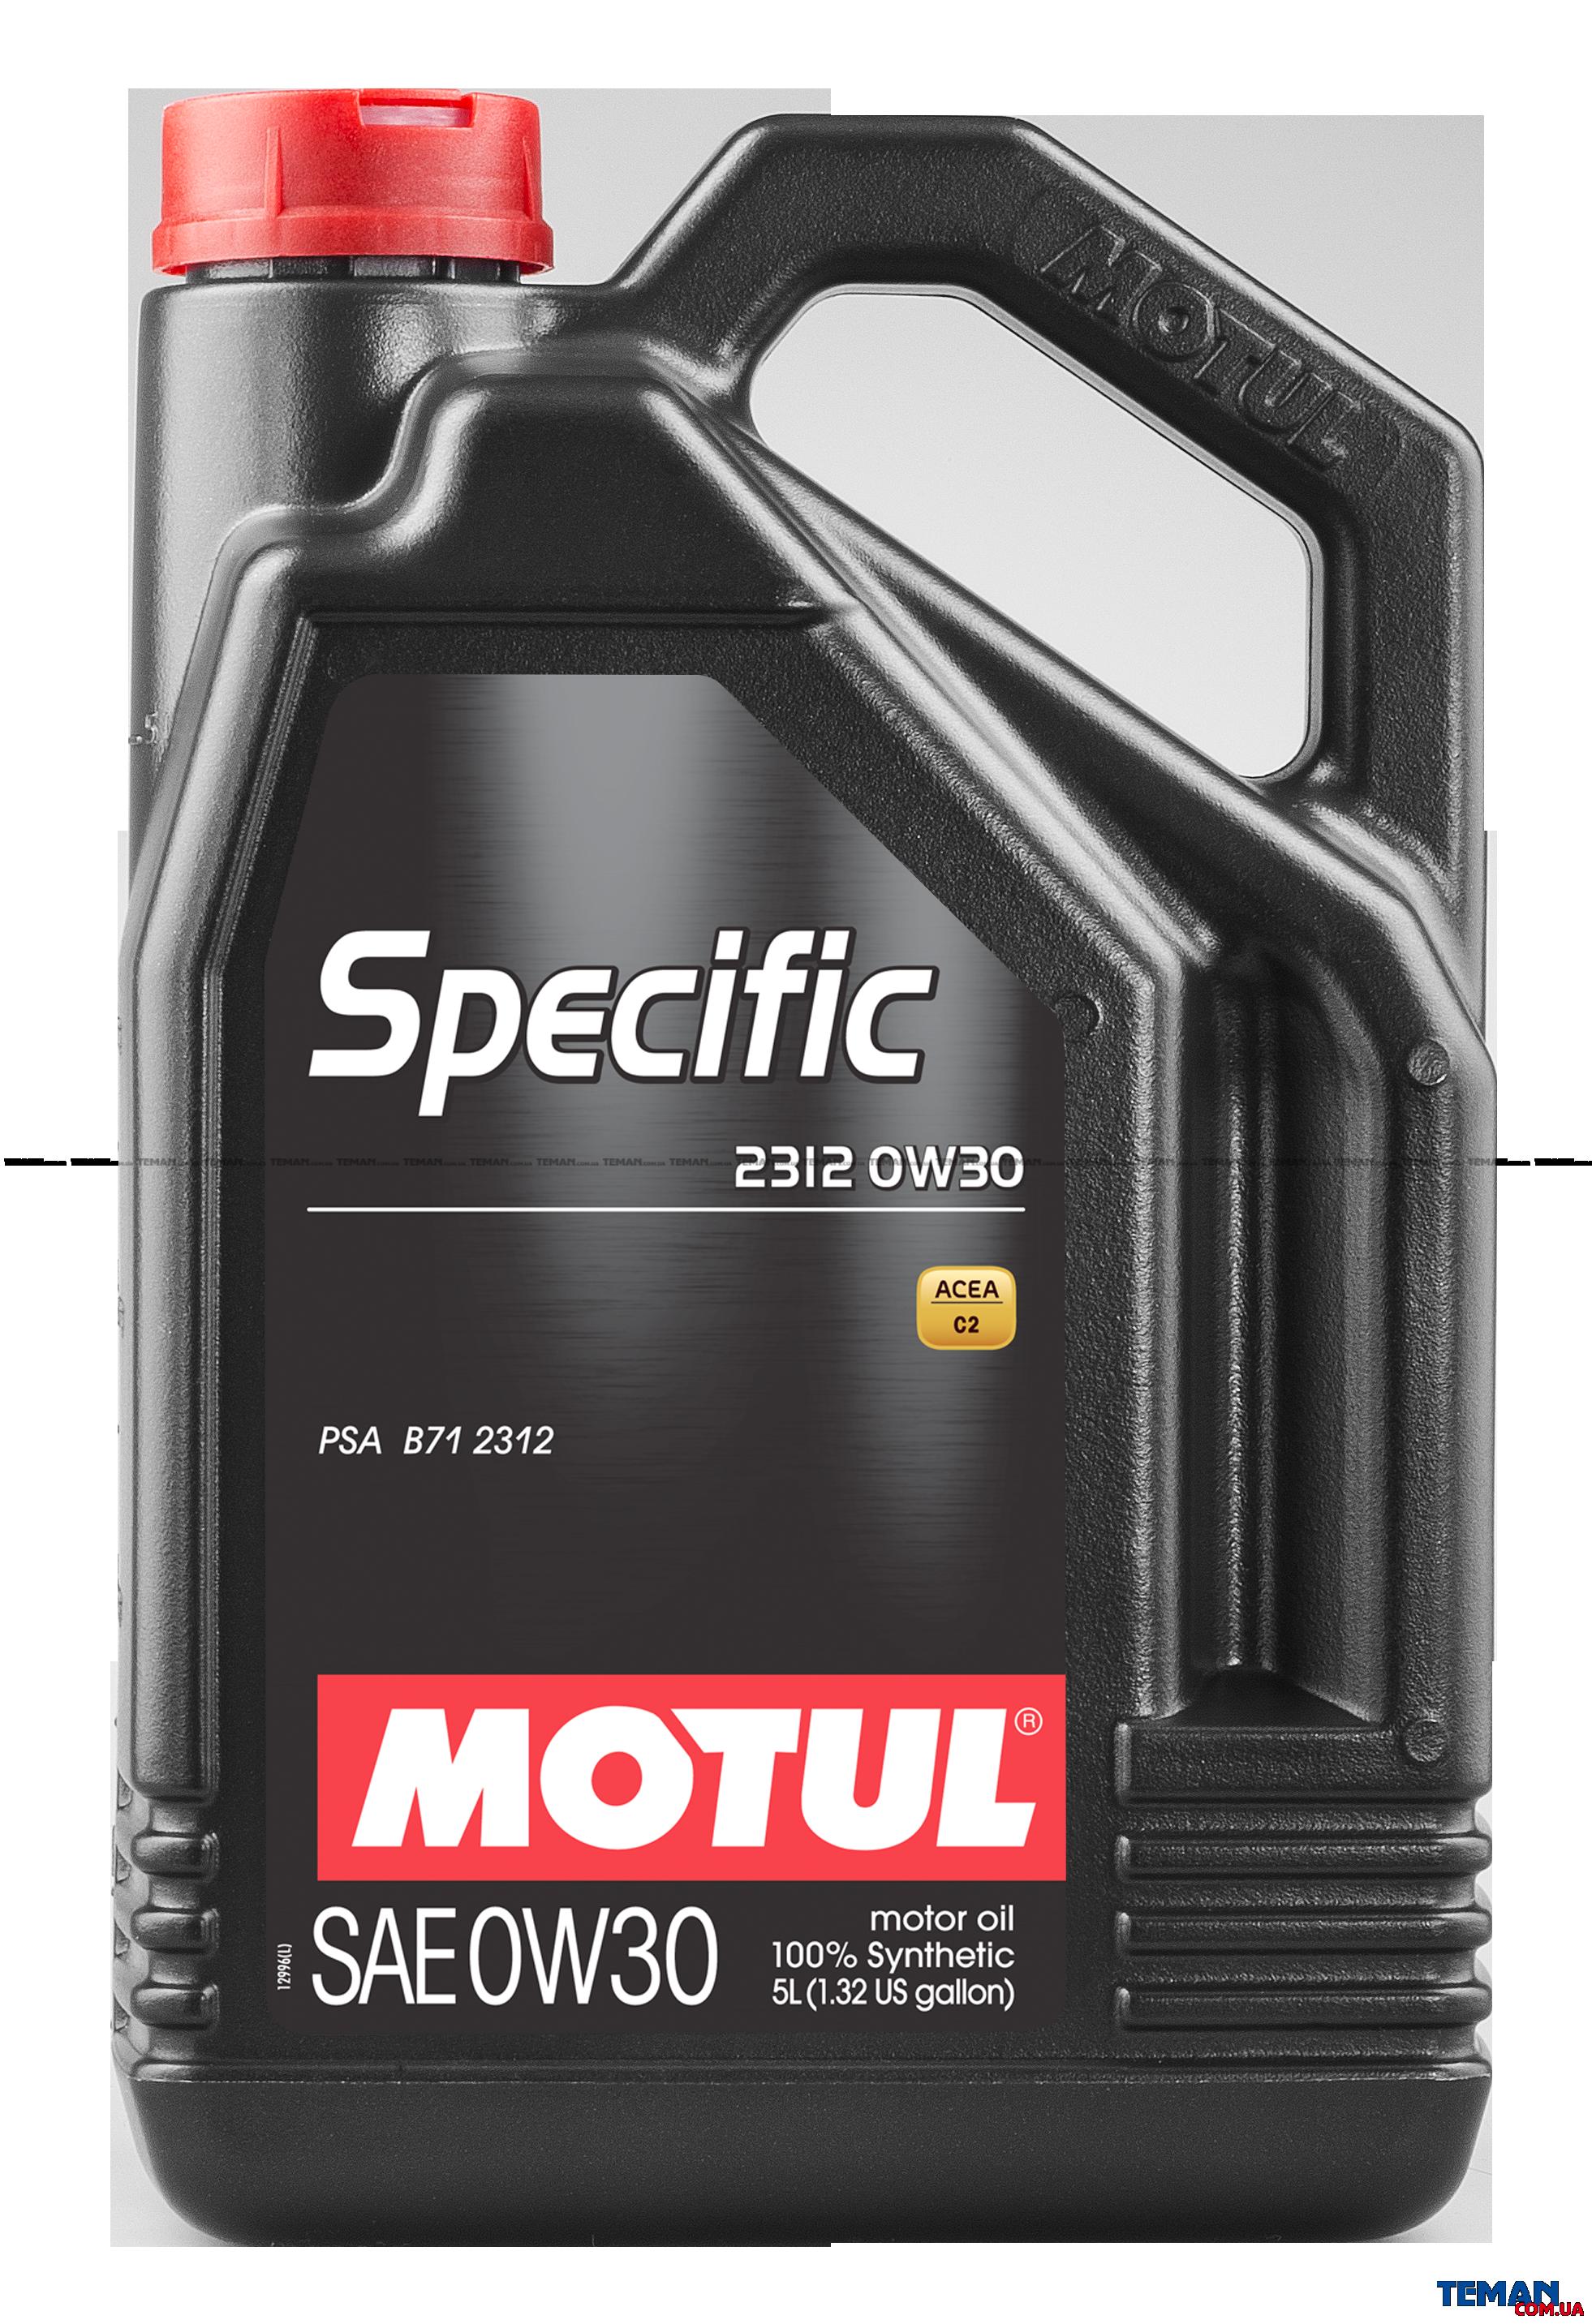 Синтетическое моторное масло Specific 2312 SAE 0W30, 5 л